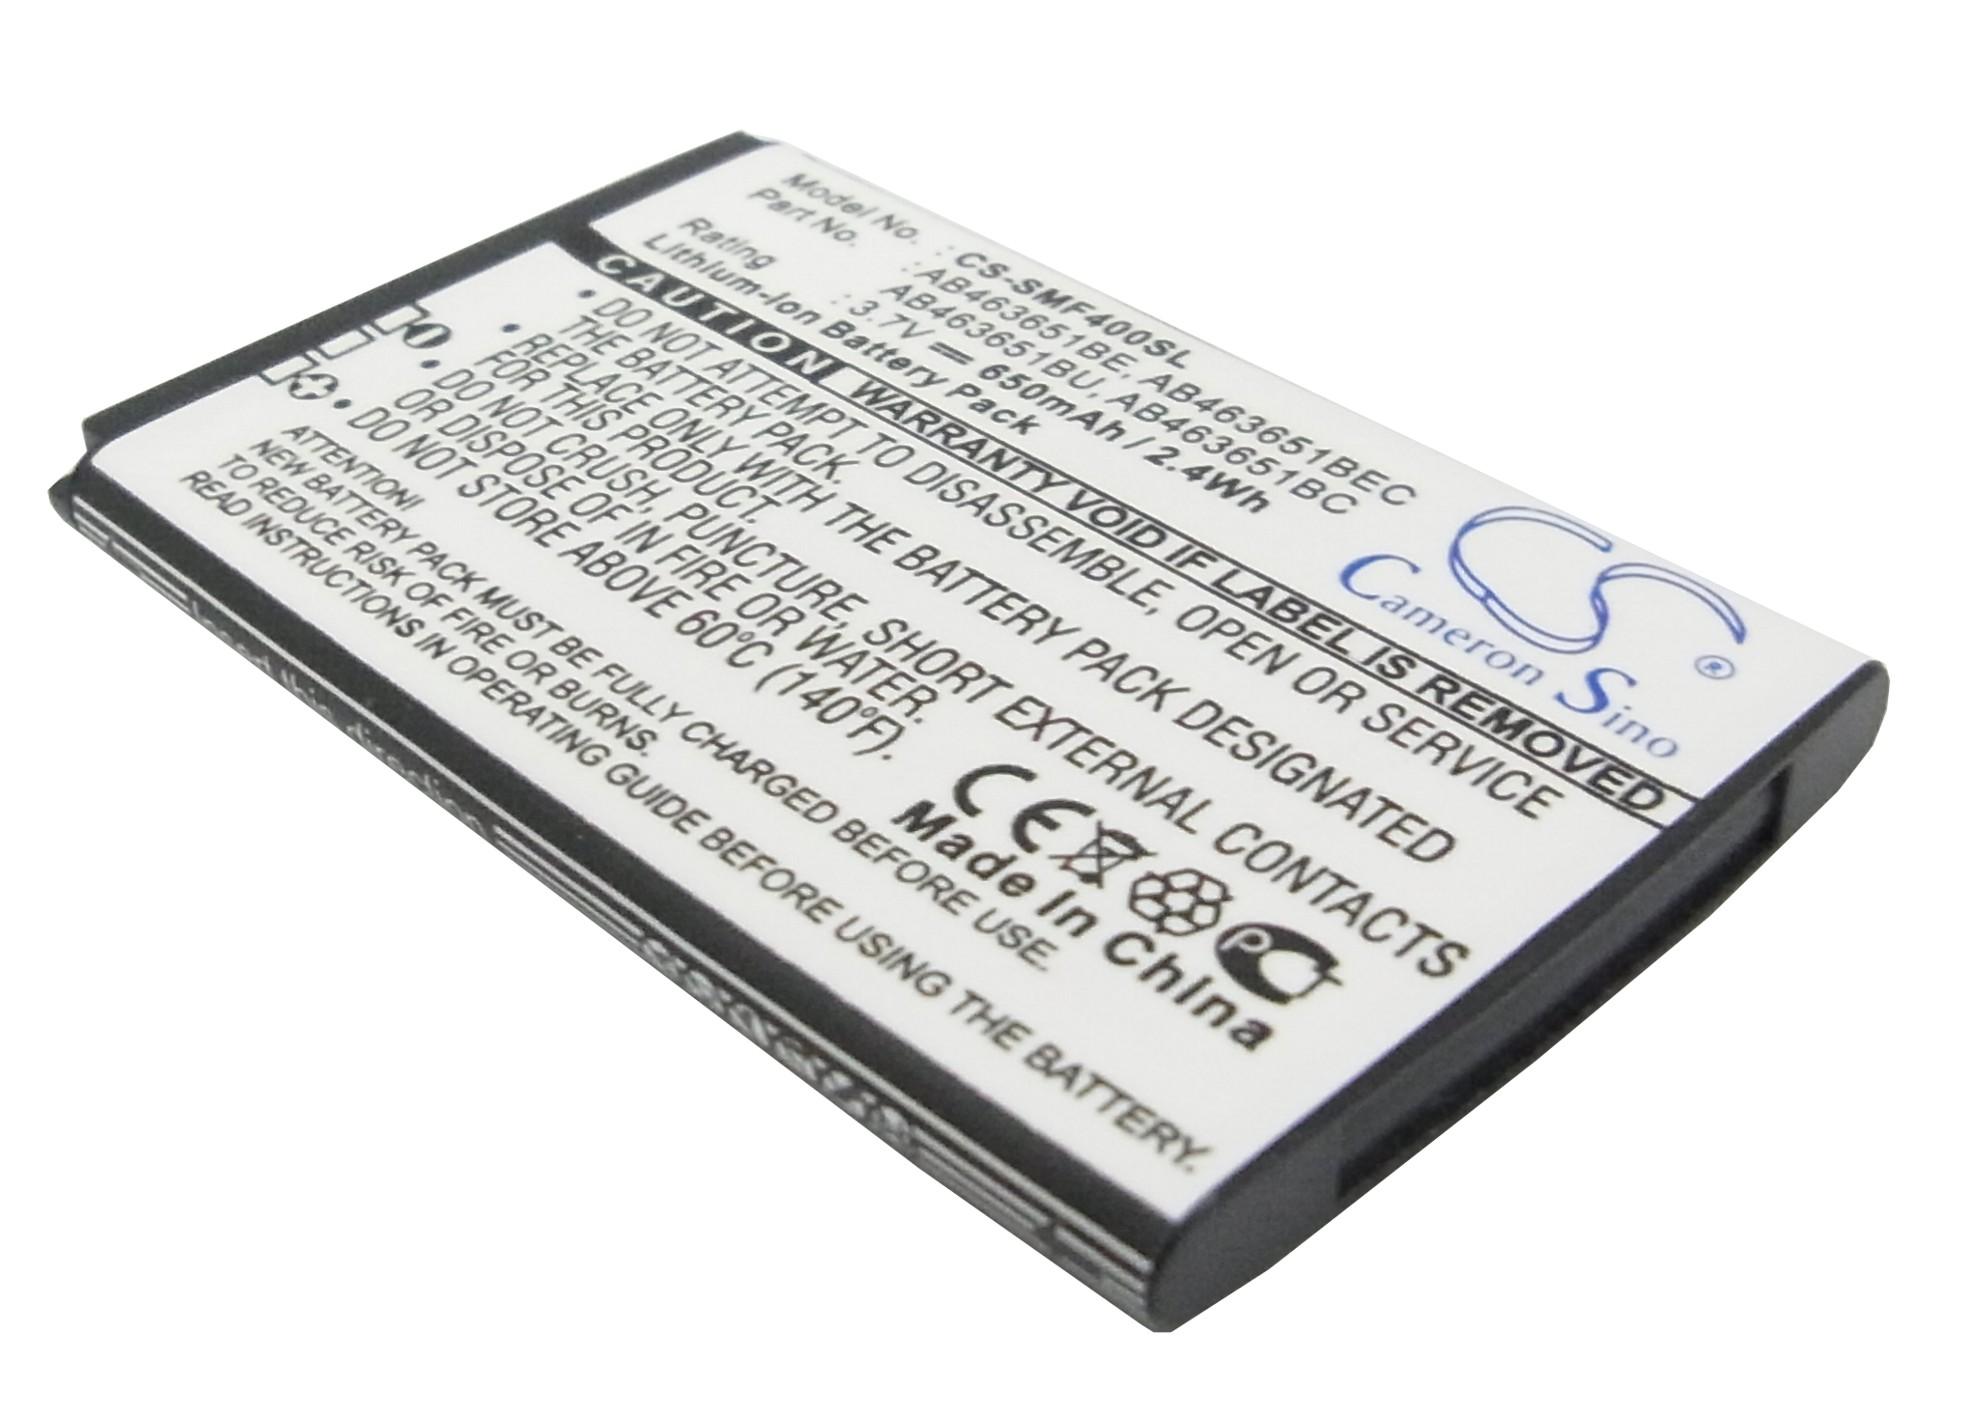 Cameron Sino baterie do mobilů pro SAMSUNG GT-S5600 3.7V Li-ion 650mAh černá - neoriginální